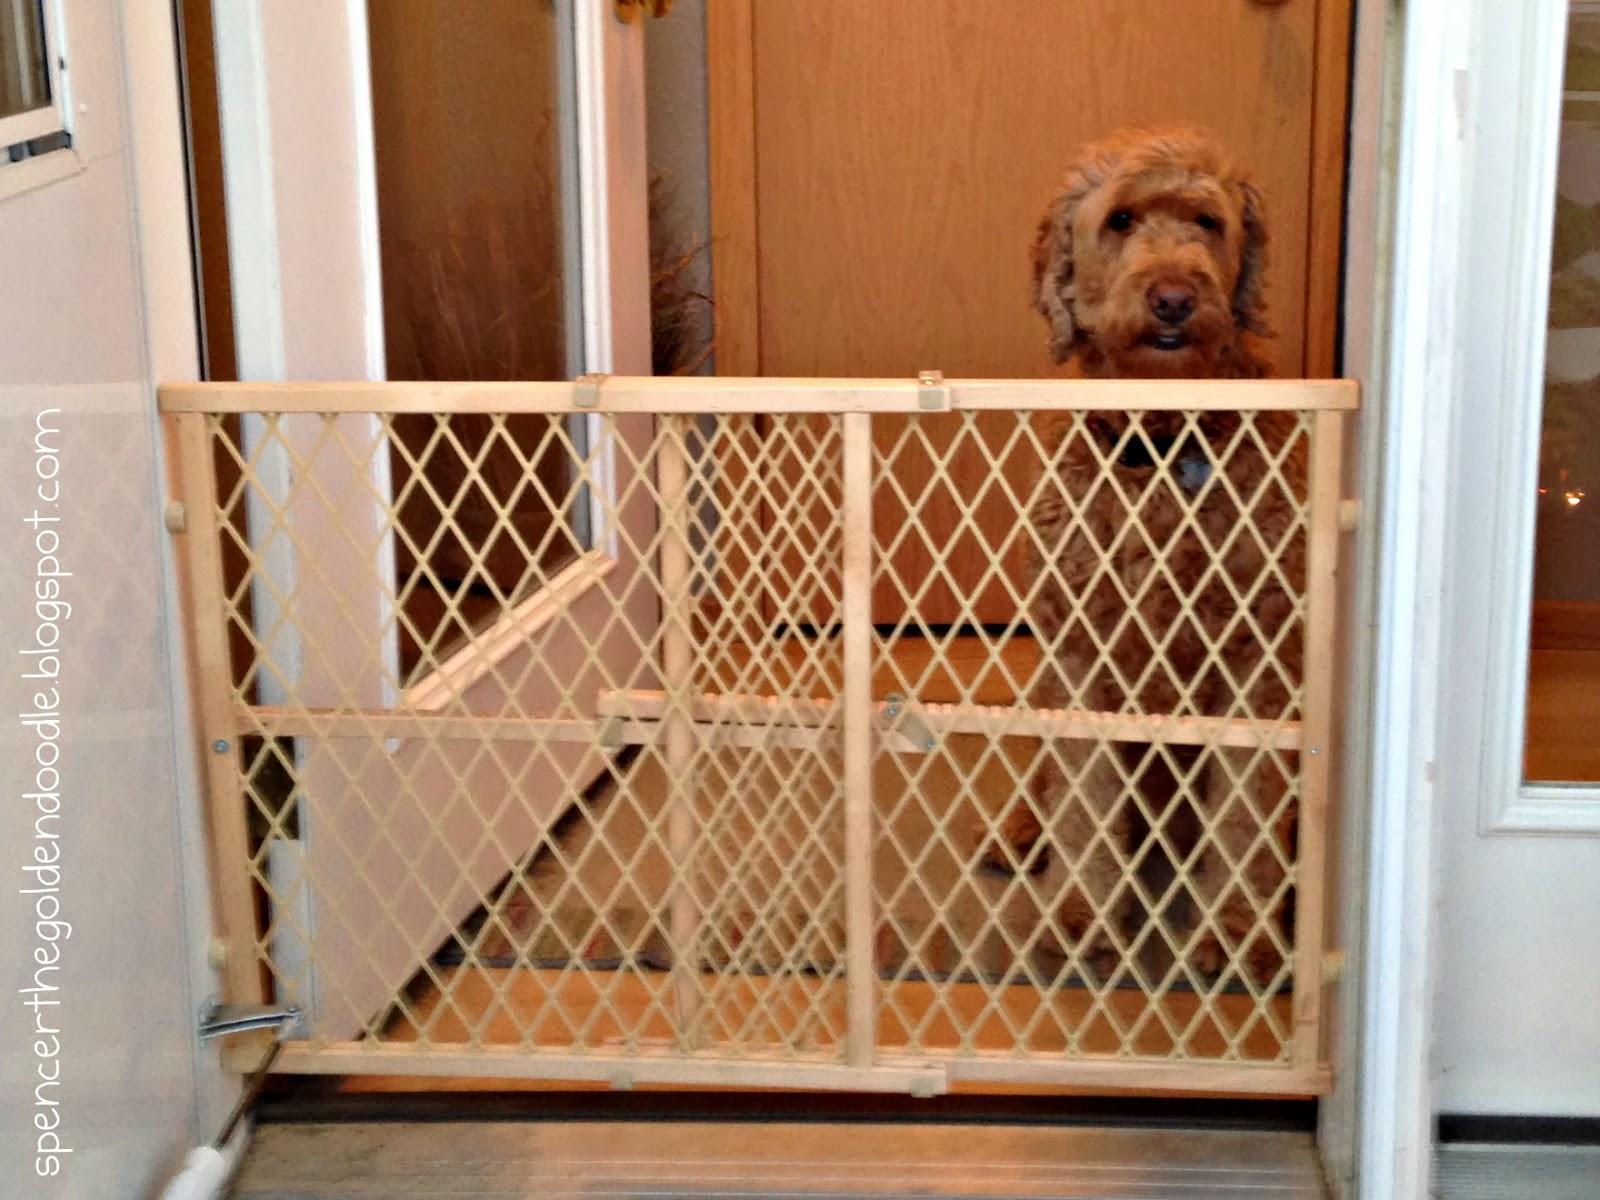 Hmh Designs Diy Dog Gate From A Bench A Tutorial